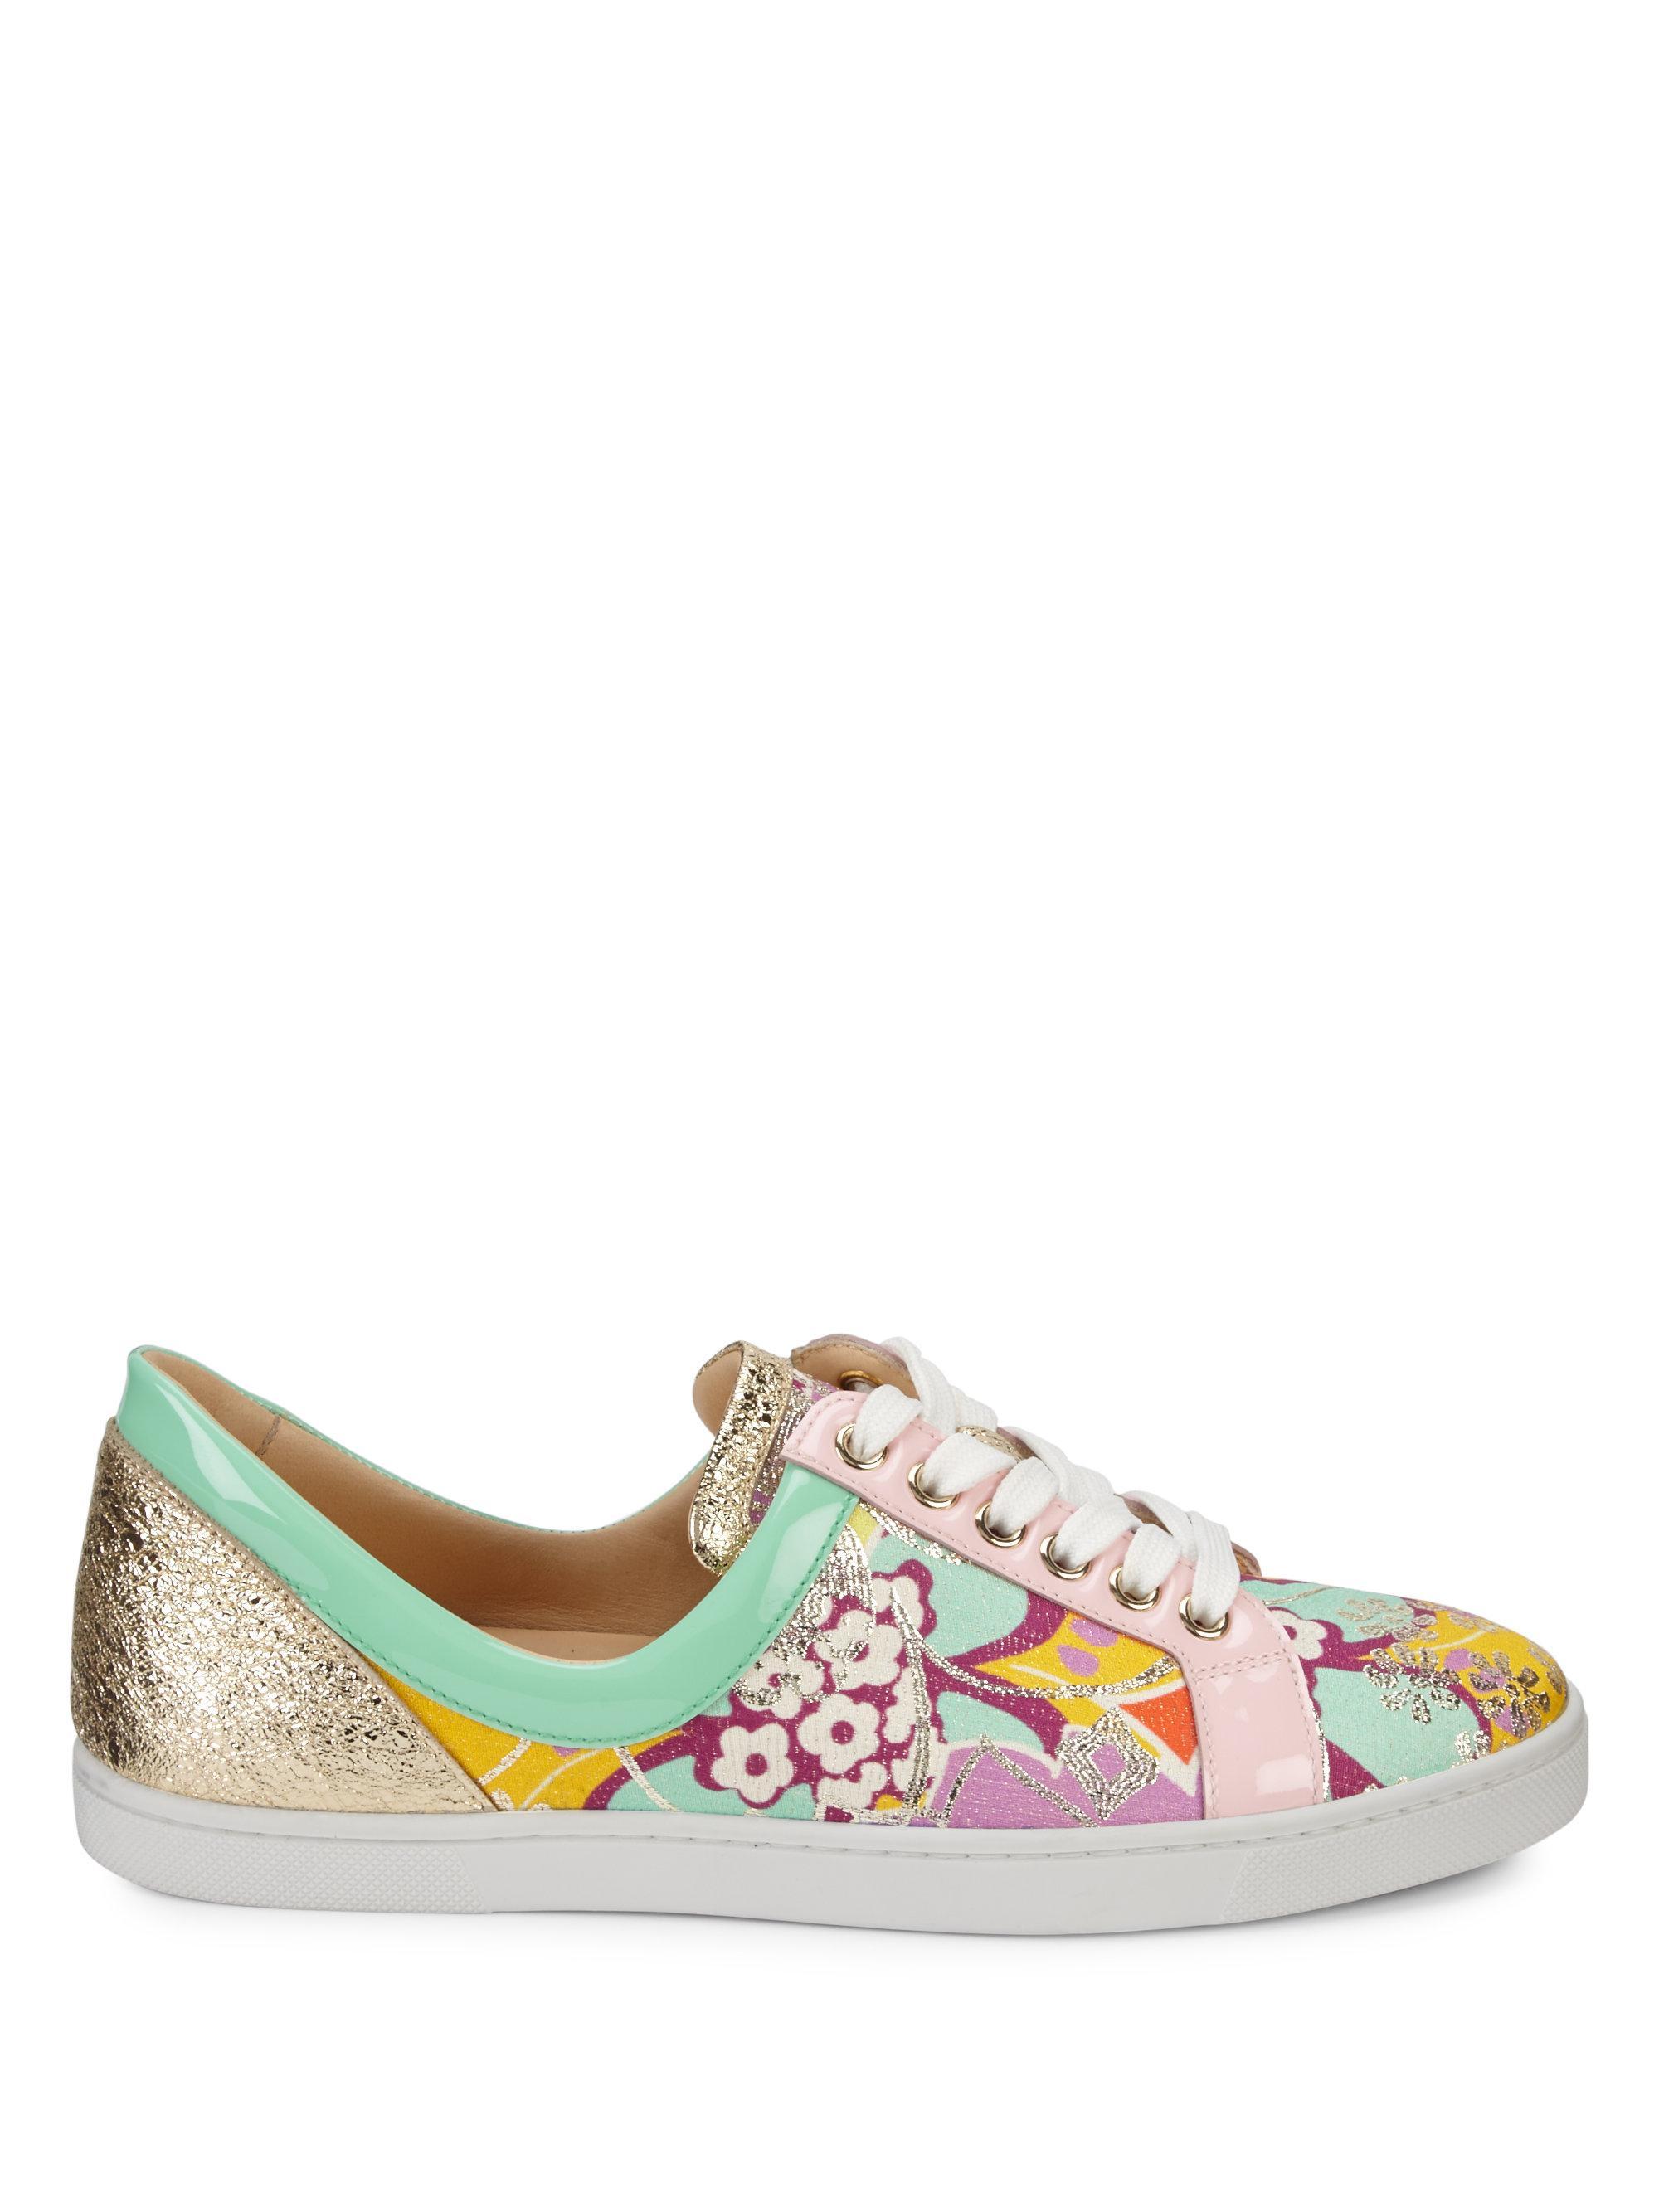 1926335c4069 Lyst - Christian Louboutin Flamingirl Glitter Sneakers